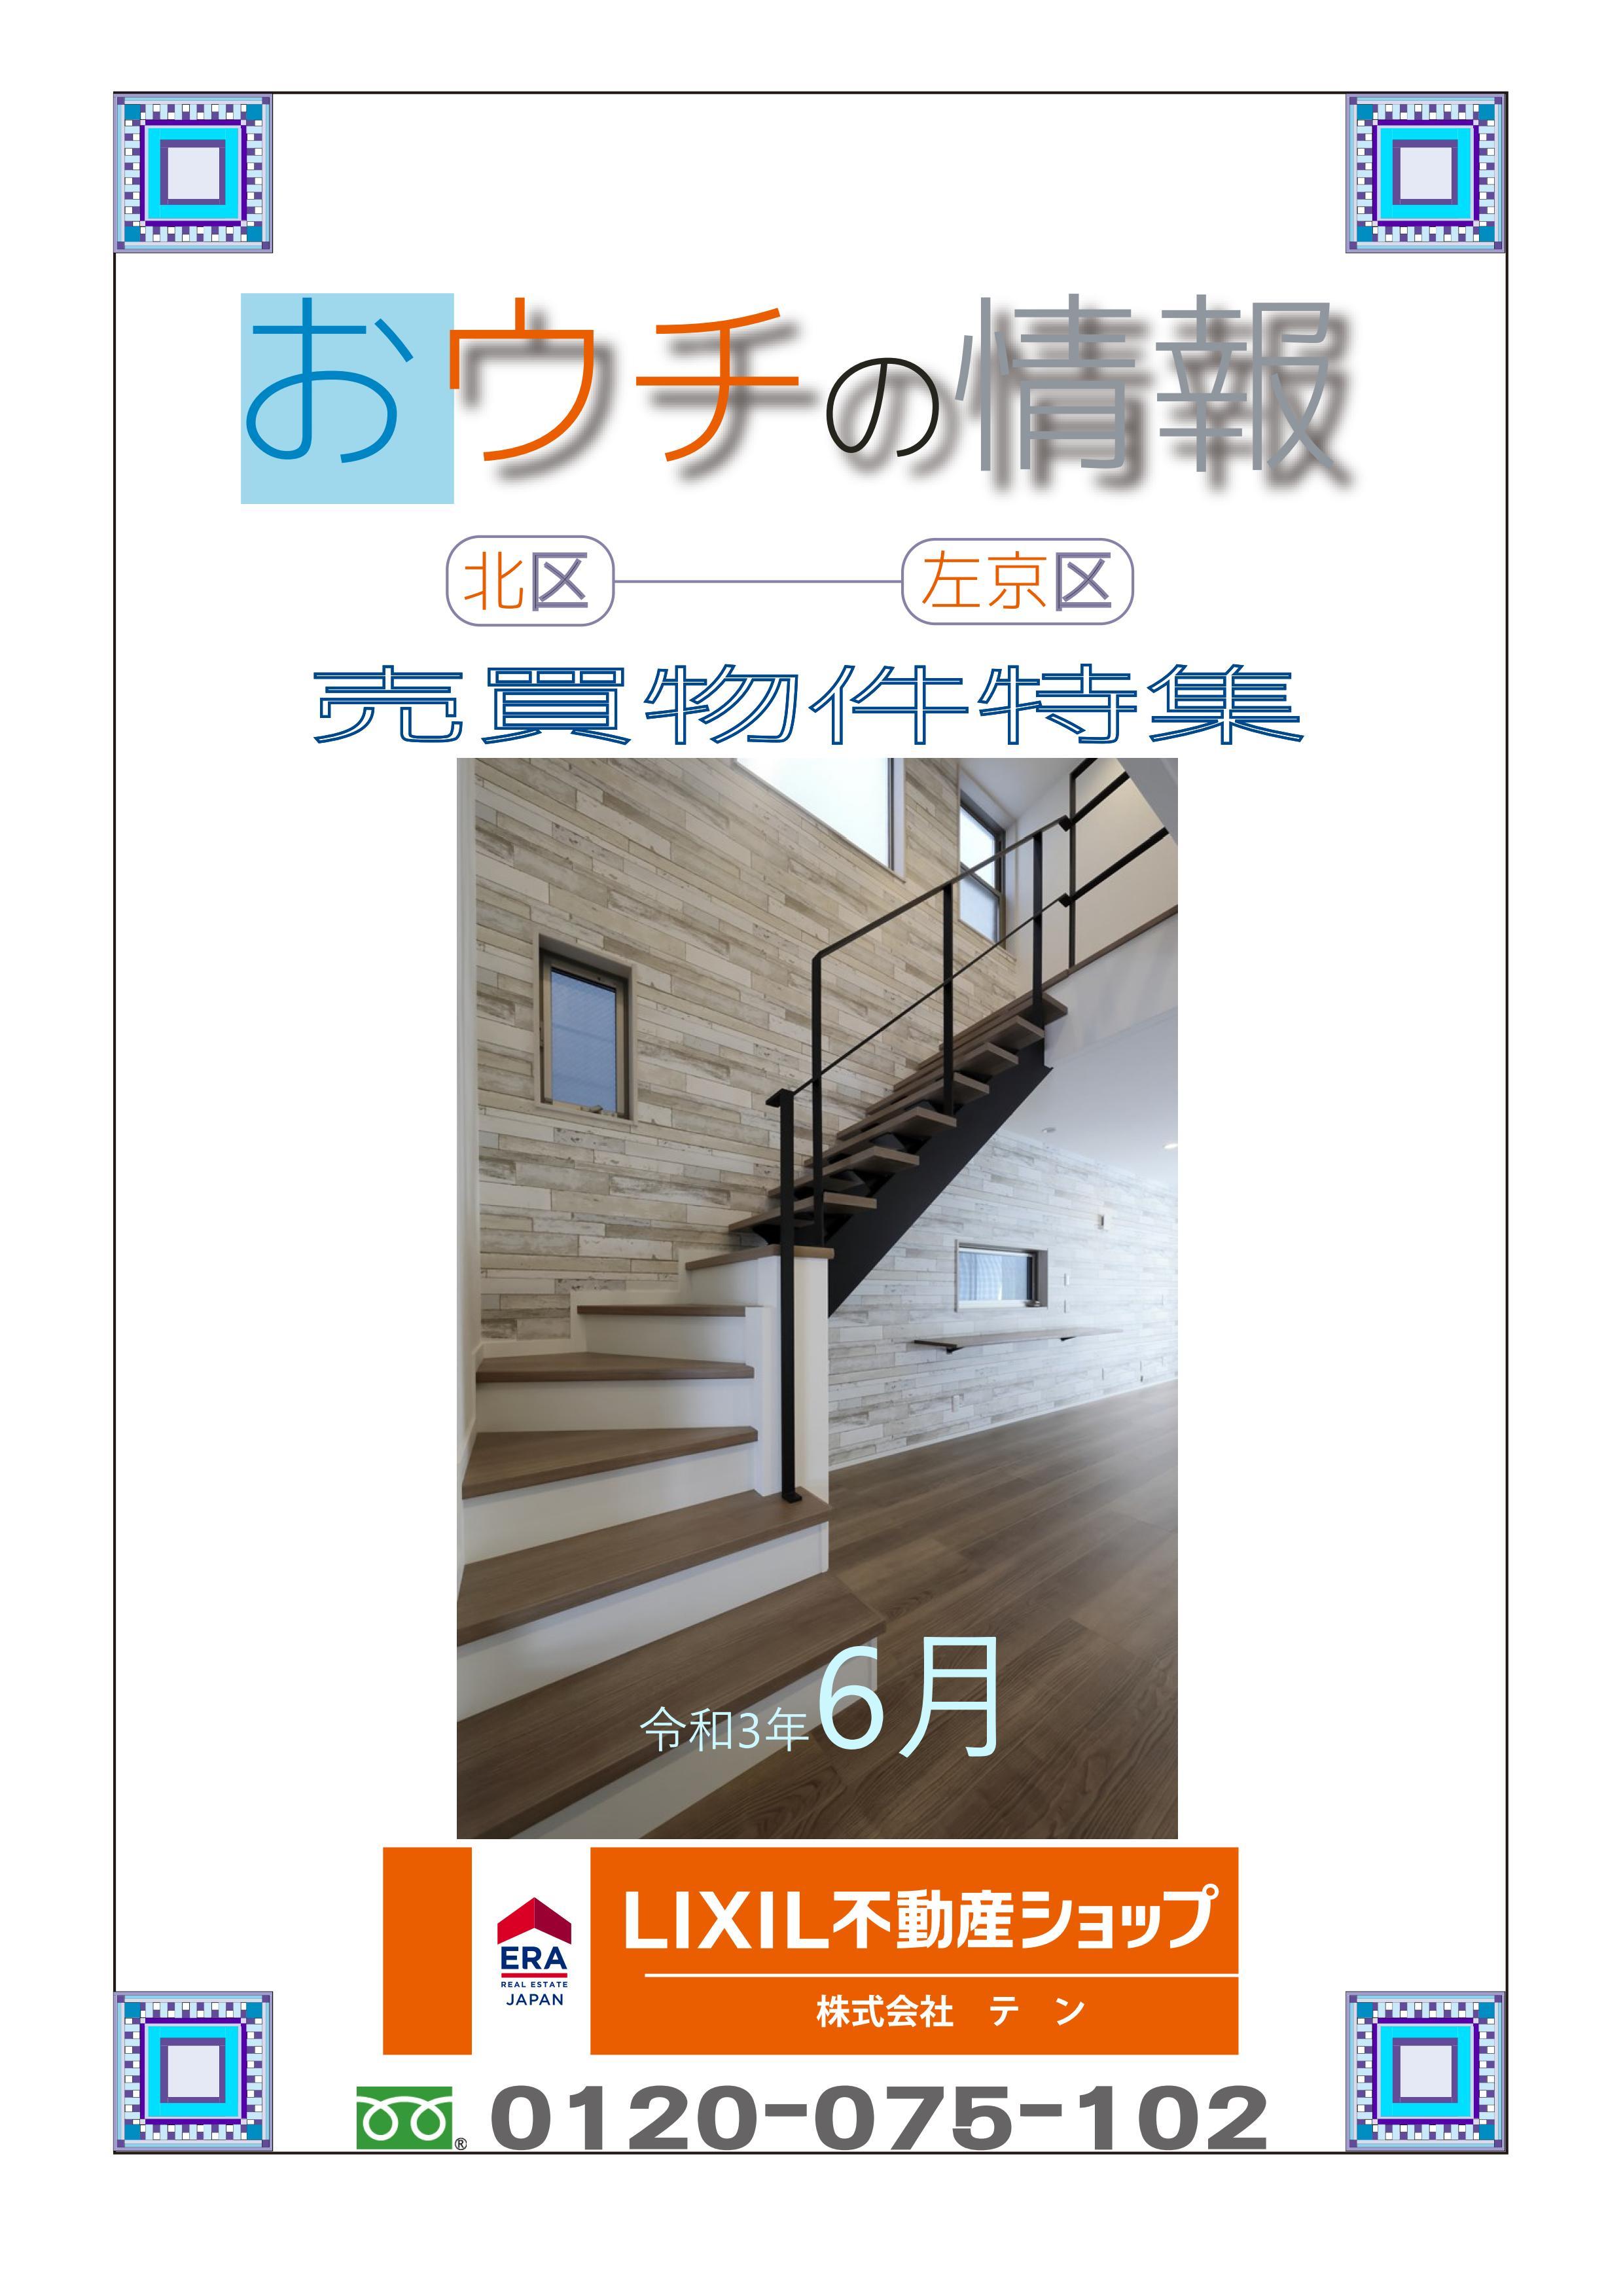 https://www.eraten.jp/blog/images/LDK.jpg